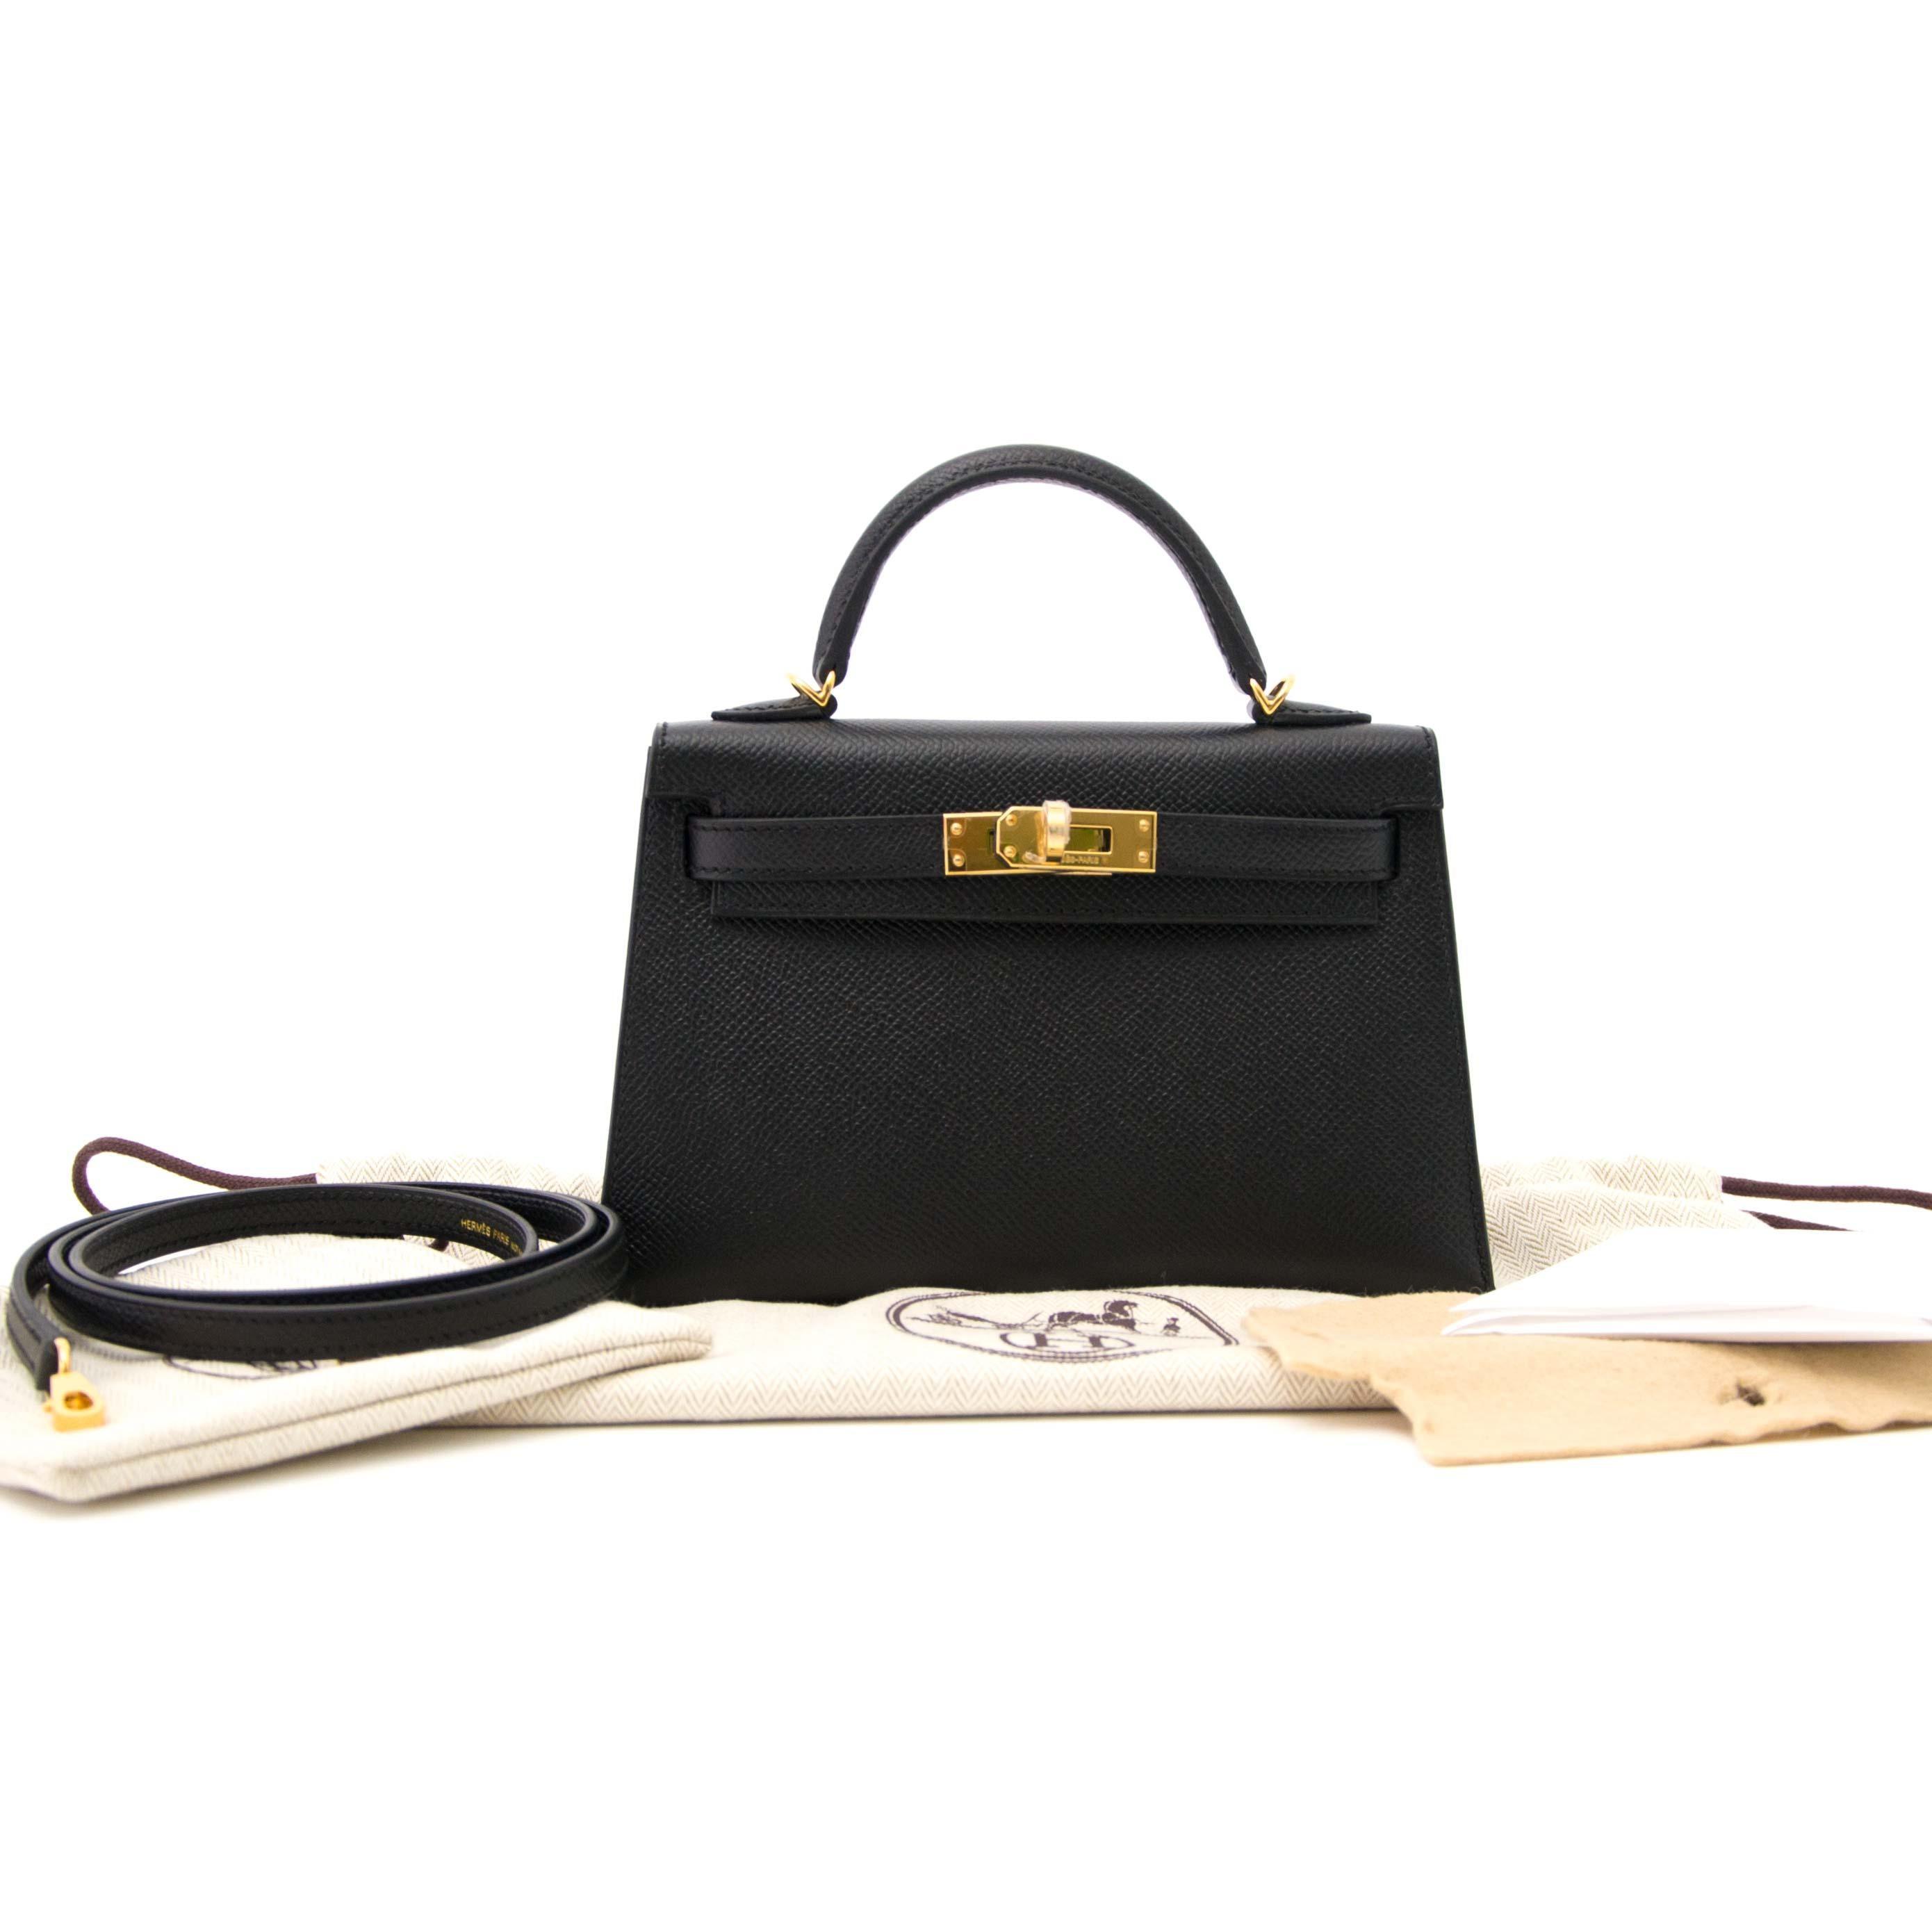 71a0f102523e ... new zealand hermes kelly mini ii 20cm black epsom ghw bag for sale 3  ff510 33173